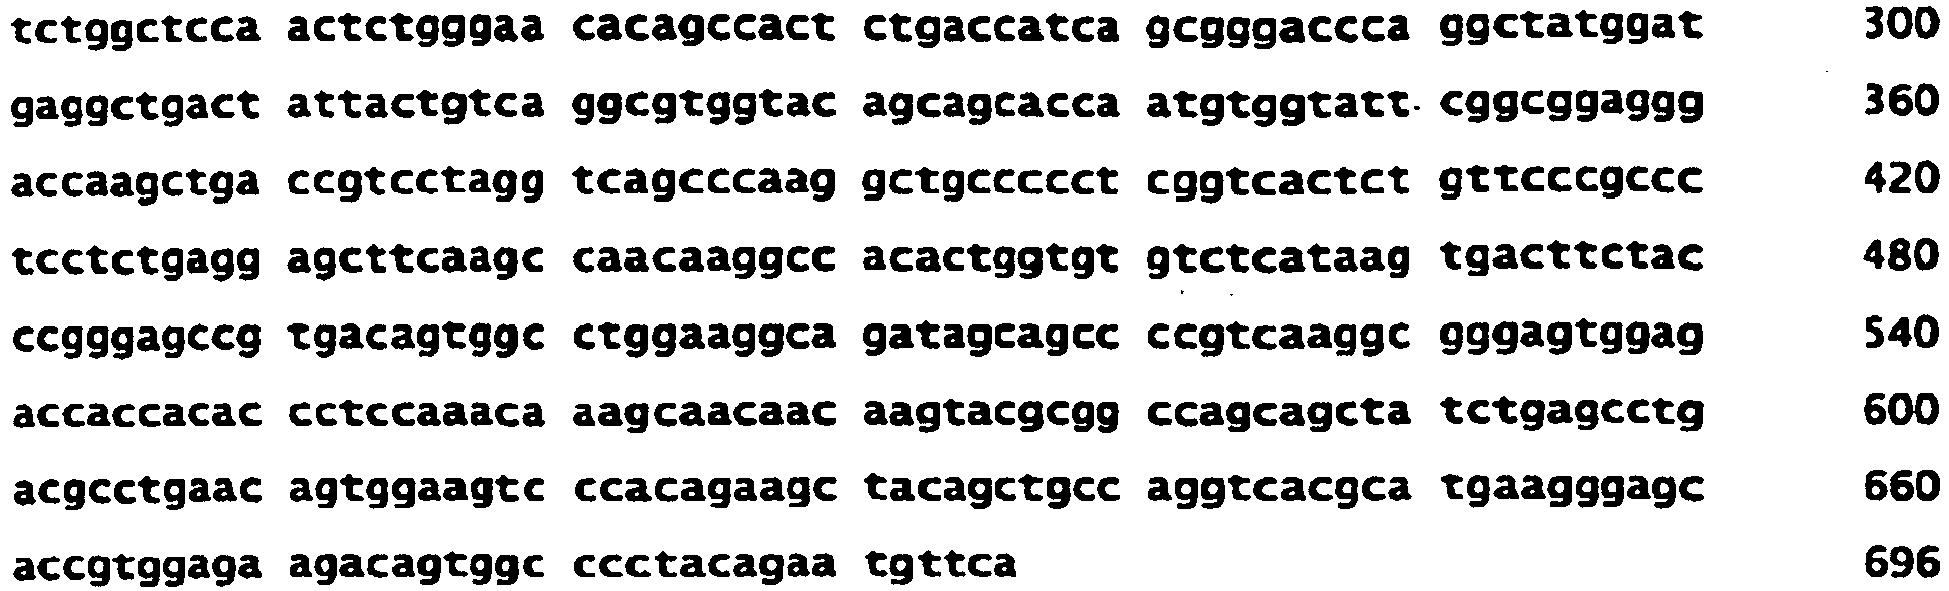 Figure imgb0307